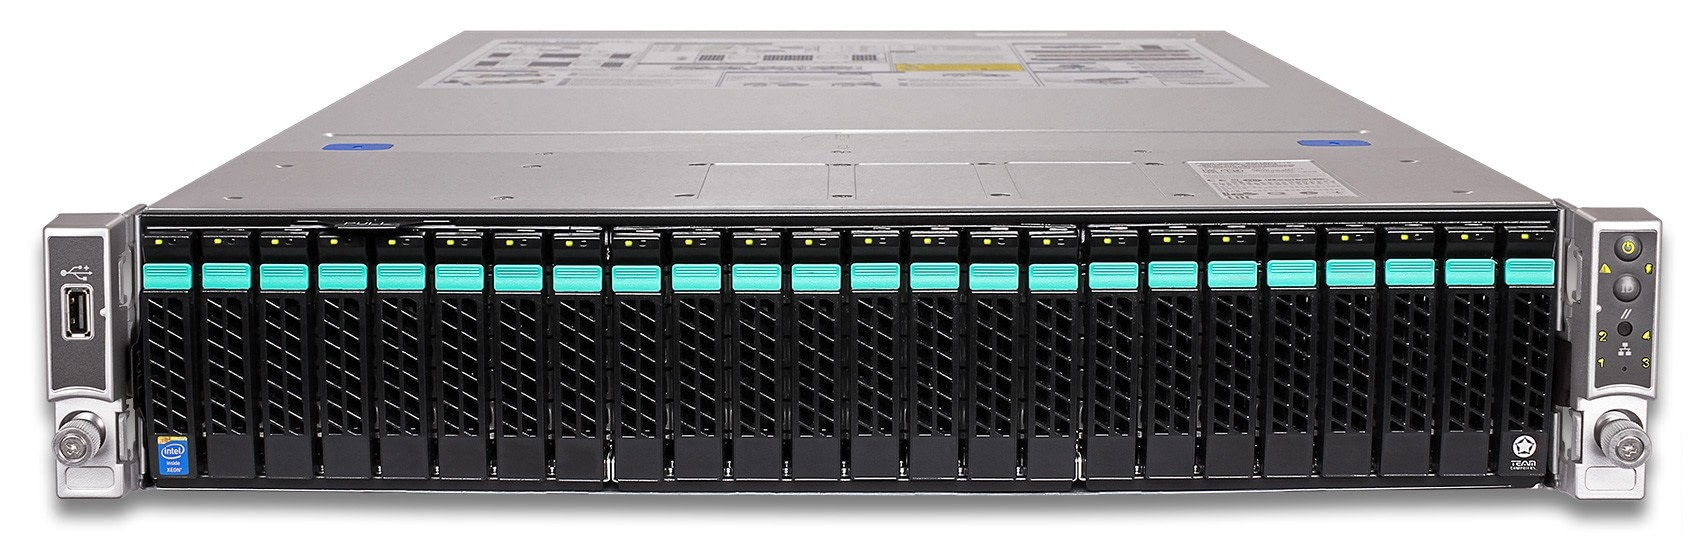 Сервер (б/у) Intel Server System R2000, R2224WTTYSR (BQWL64352052)